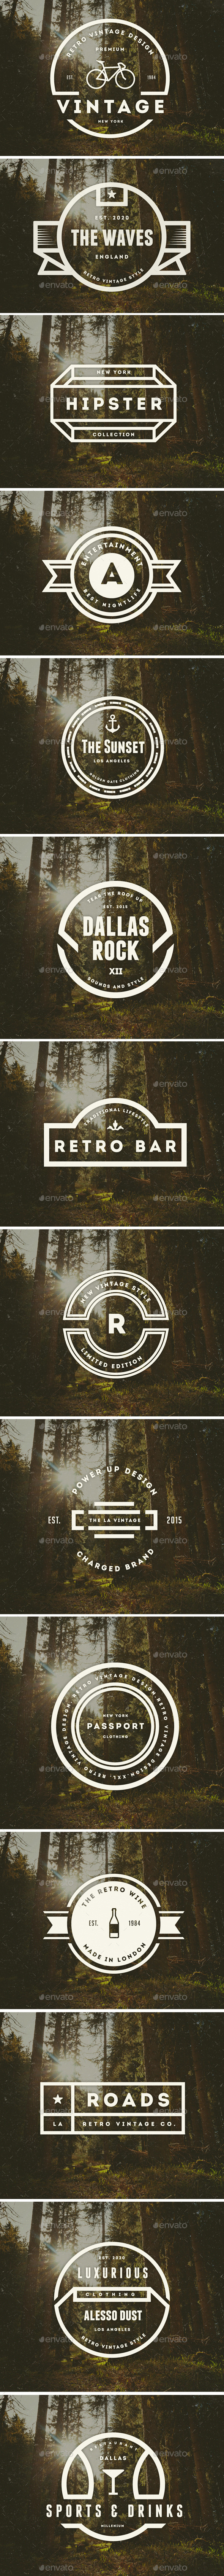 14 Vintage Logos Labels & Badges - Badges & Stickers Web Elements